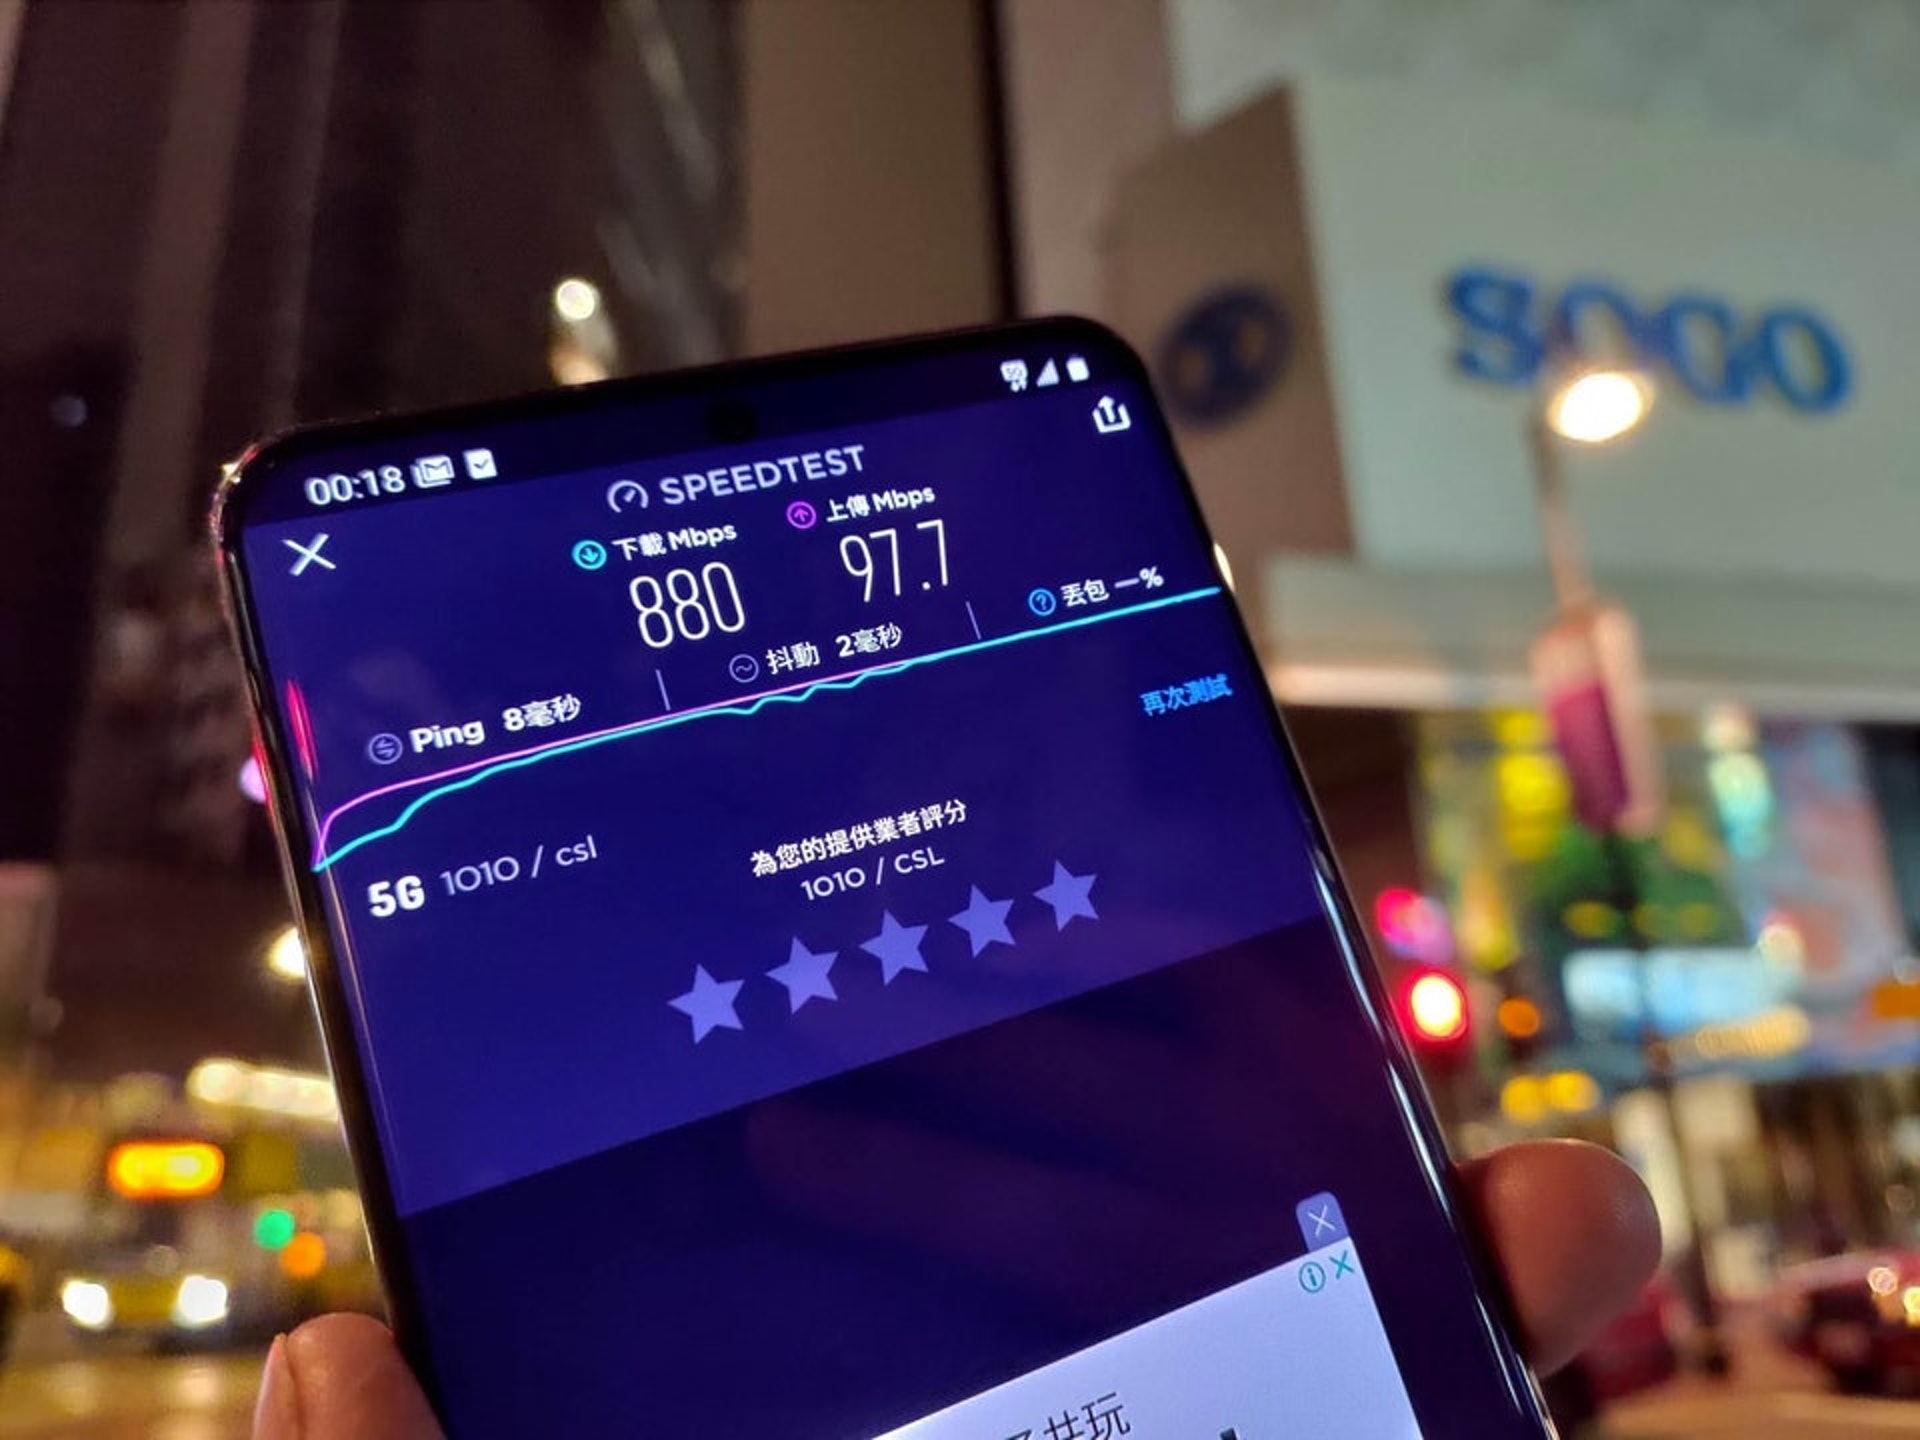 5G網絡最高可達800-900Mbps下載速度,睇片、打機更爽。(蔡浩騰攝)